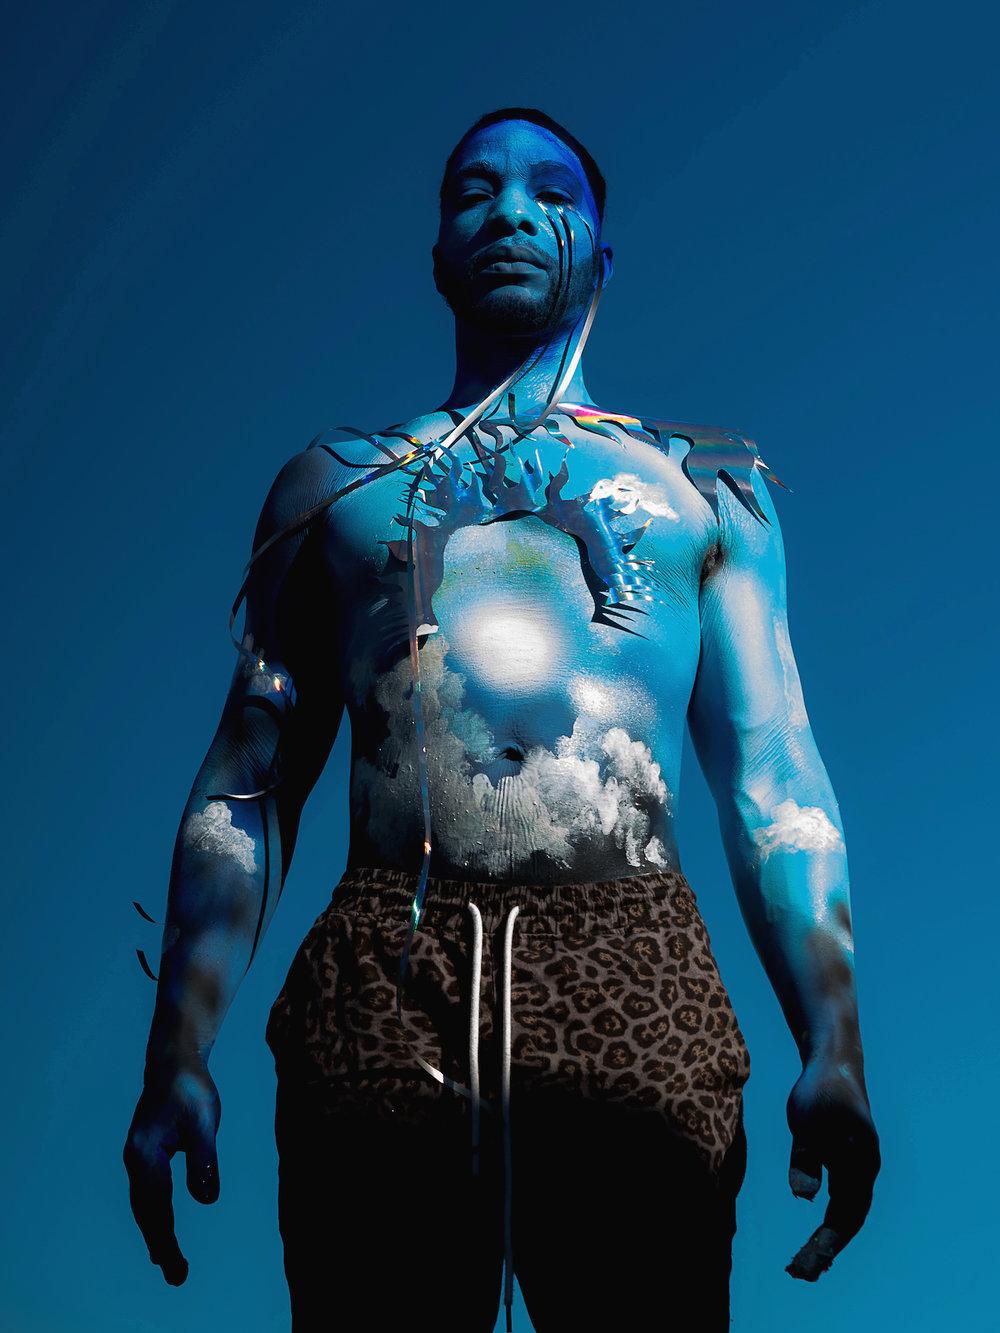 bluemahoesmallweb.jpg